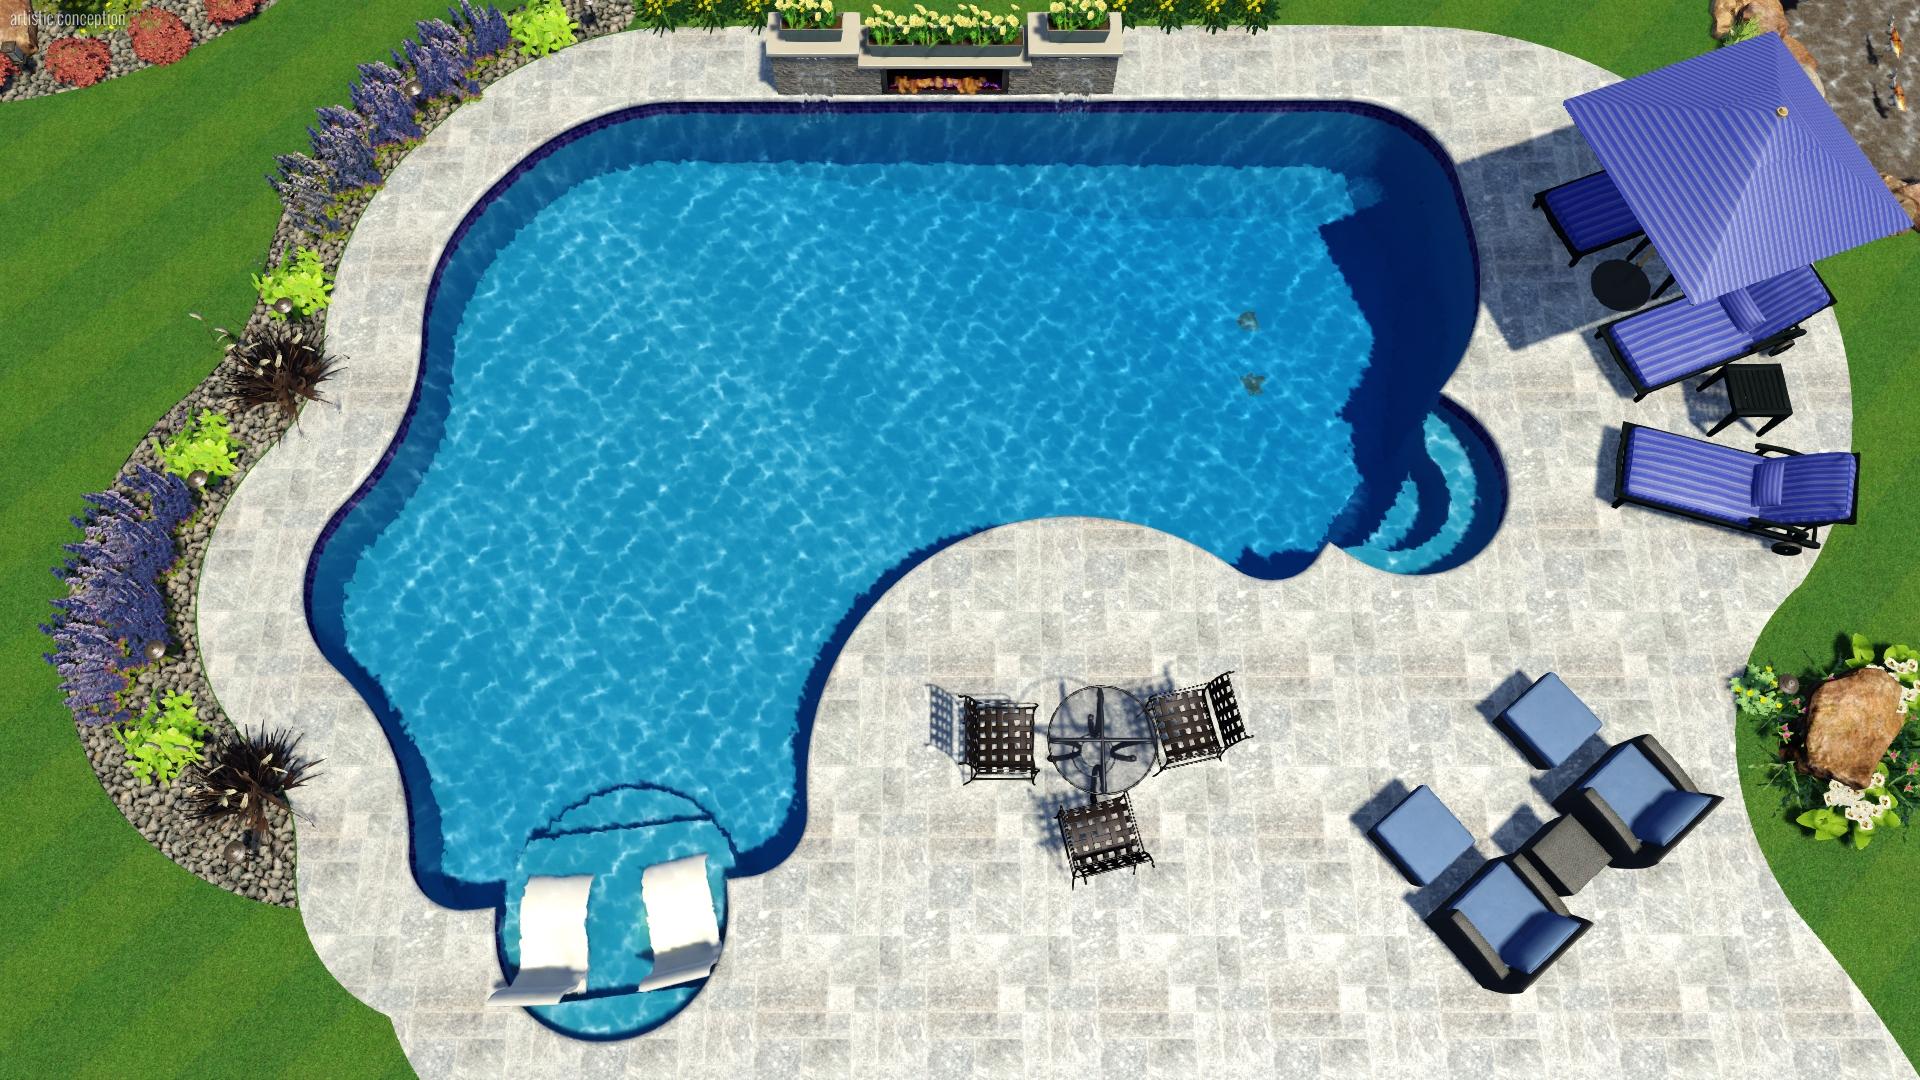 Pool-17-Natural-Spring-Ell_002